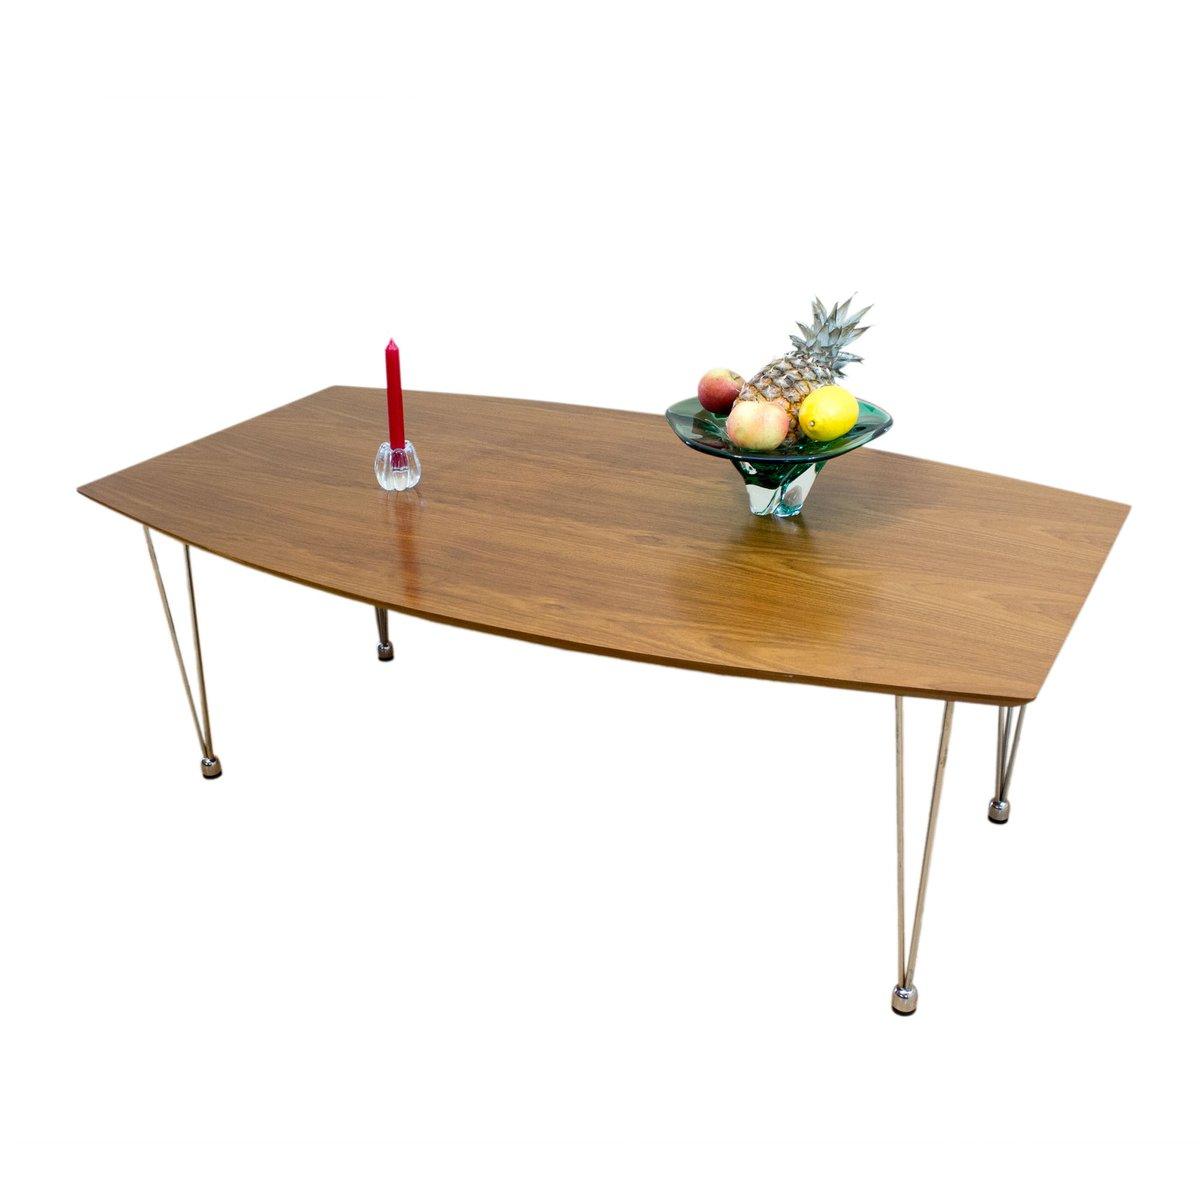 norwegischer couchtisch aus teak stahl 1960er bei. Black Bedroom Furniture Sets. Home Design Ideas